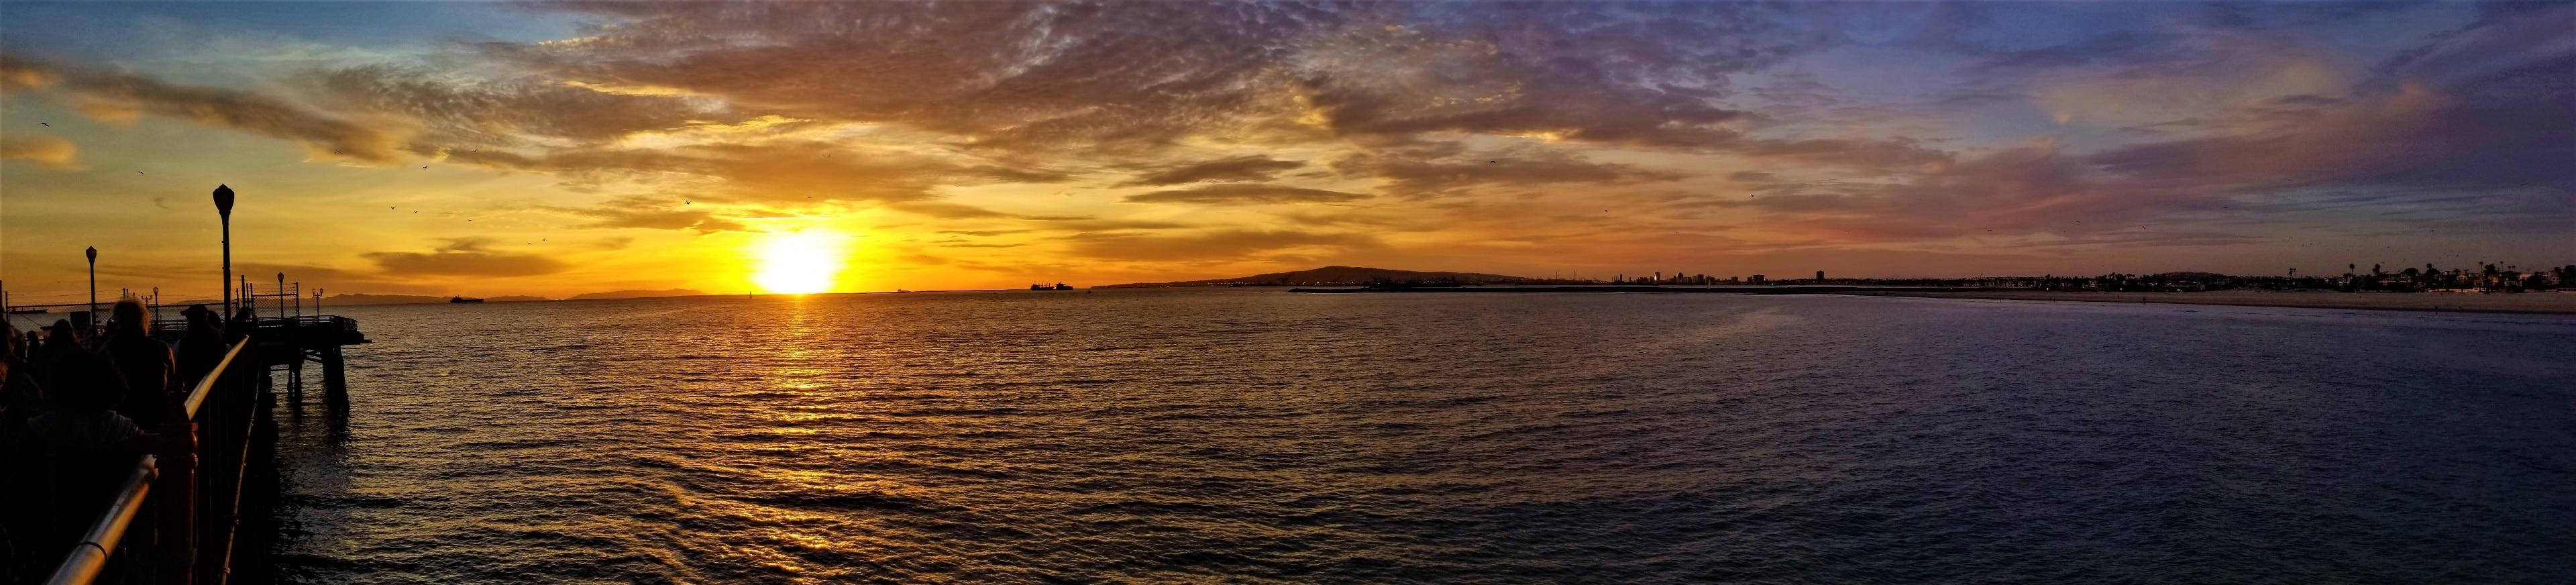 Seal Beach, California, United States of America